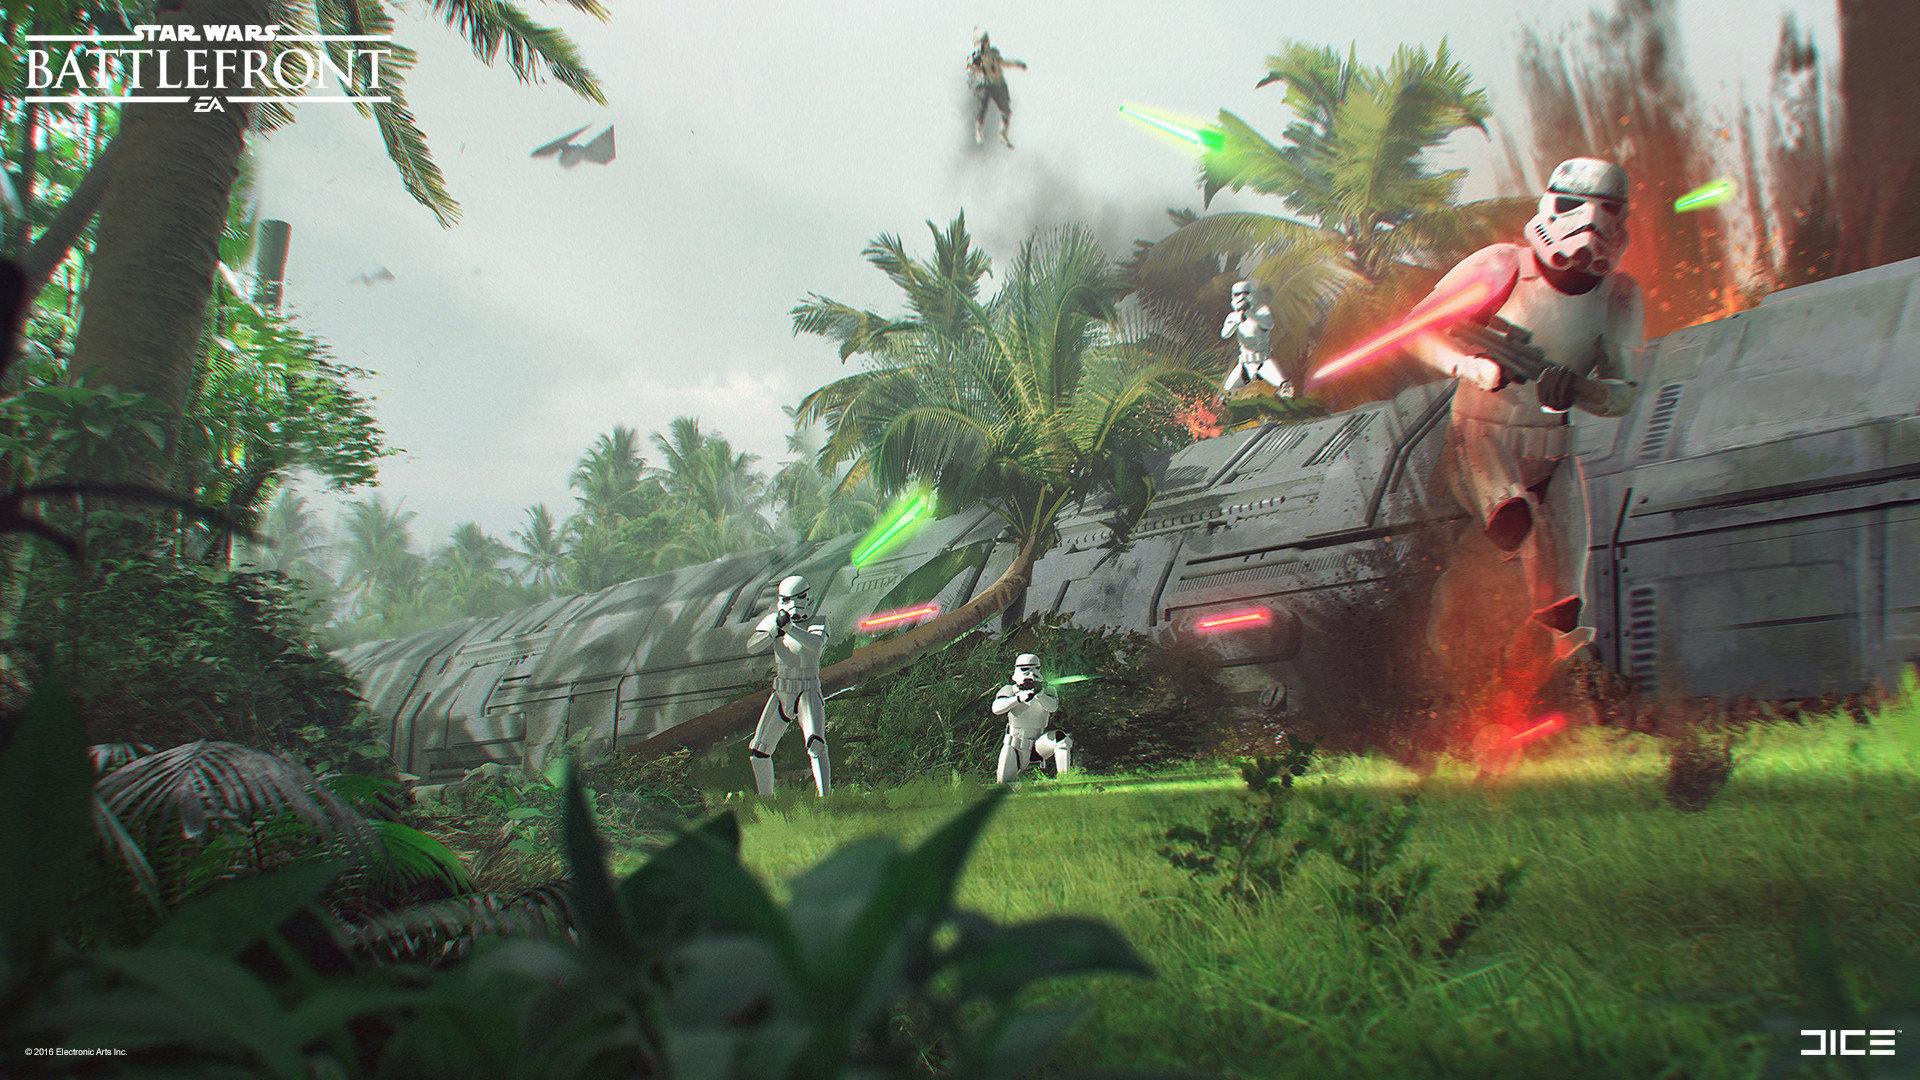 star wars battlefront wallpaper hd 1080p 162551